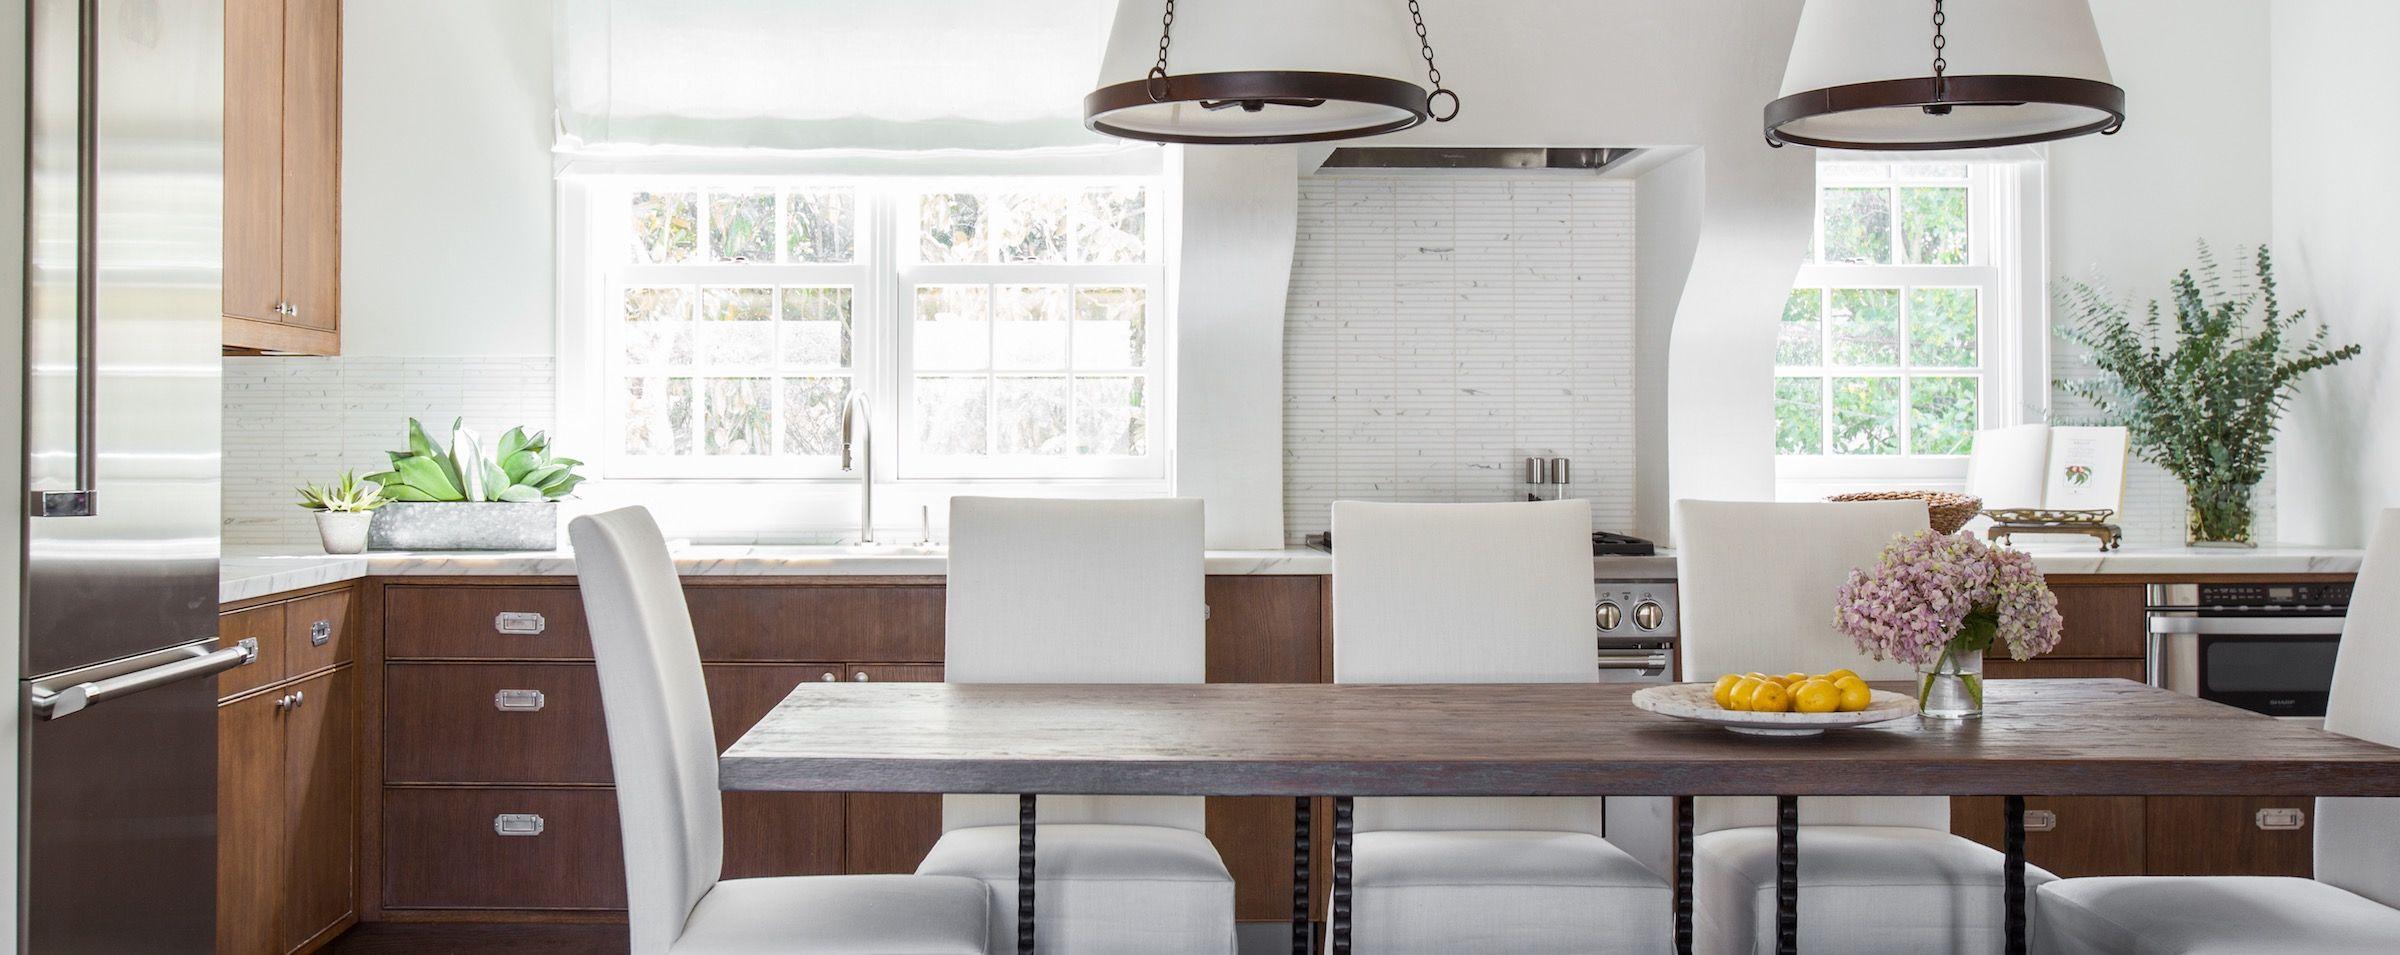 Interior-Design-Kitchen-Open-Concept-Marie-Flanigan-Interiors